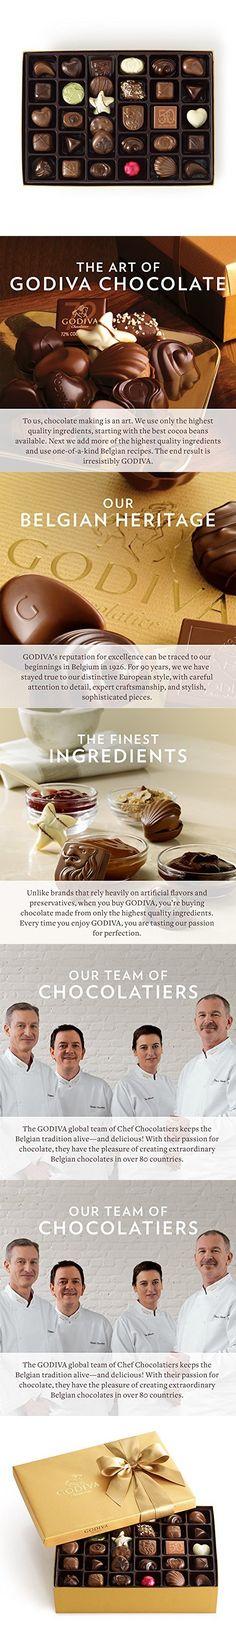 Godiva Chocolatier Classic Gold Ballotin Candy, 70 Count